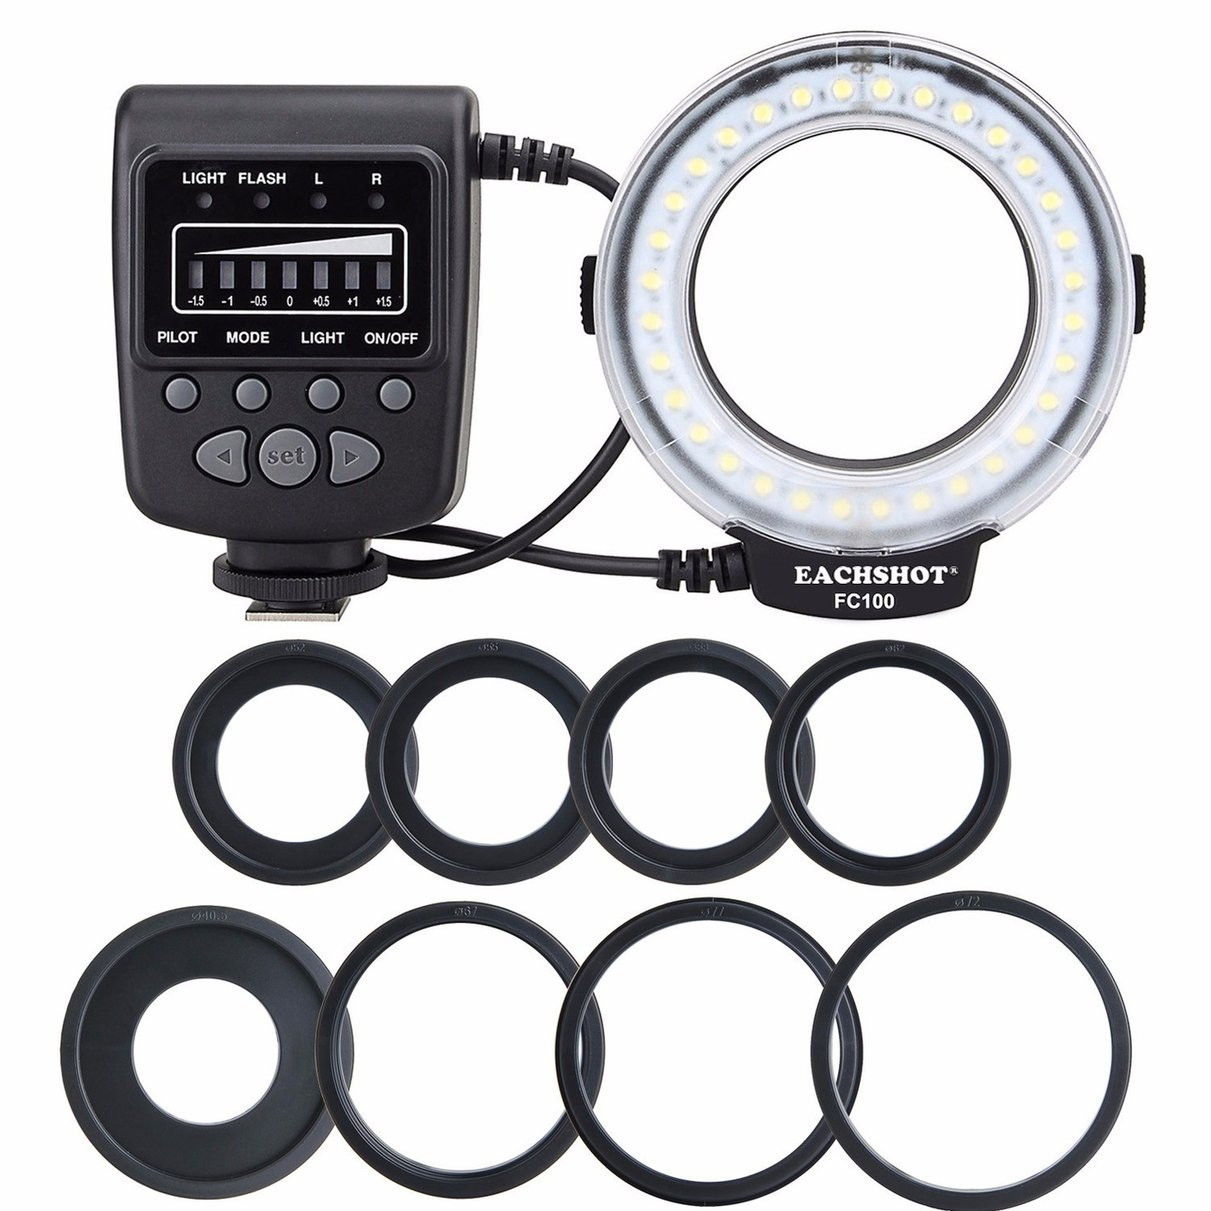 Meike FC-100 pour Nikon, Canon FC 100 Macro Ring Flash/Lumière pour Nikon D7100 D7000 D5200 D5100 D5000 D3200 D310